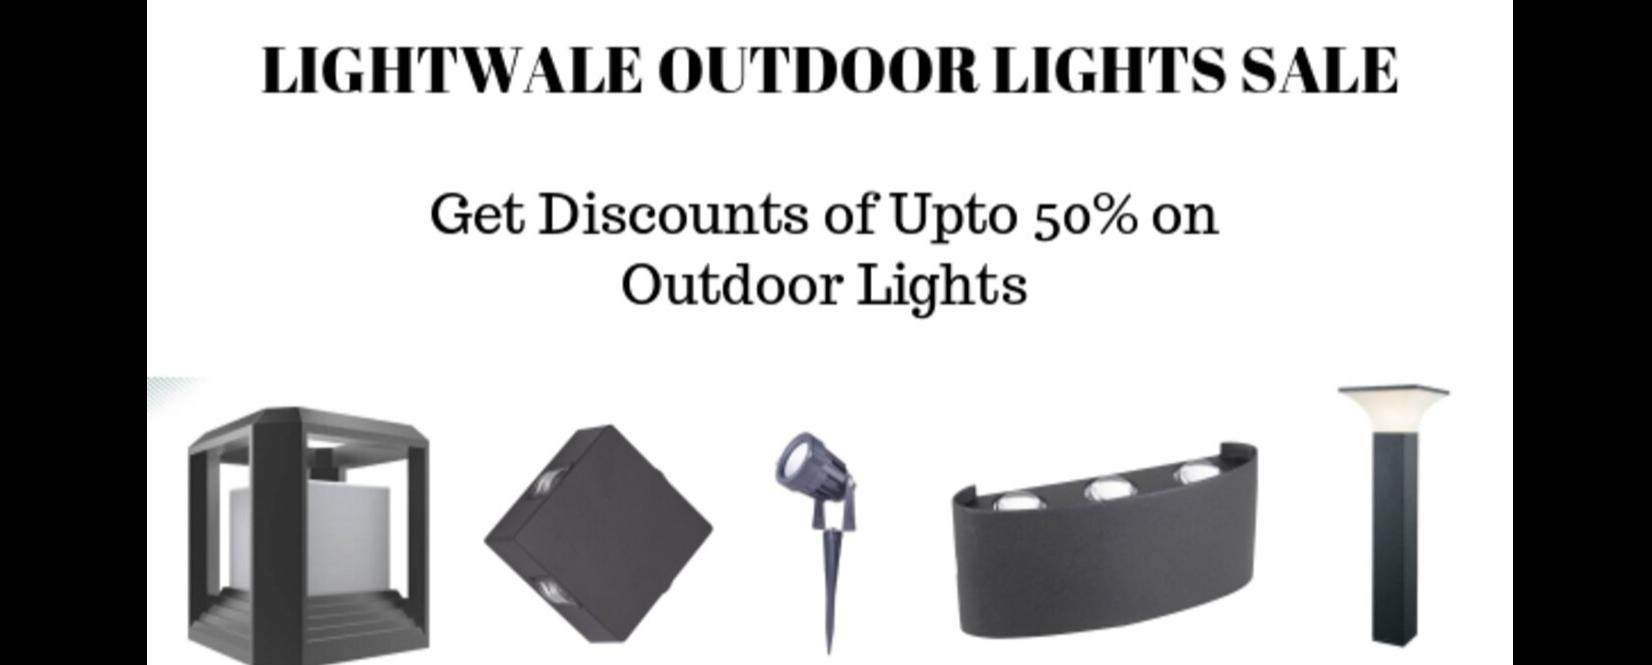 Outdoor Lights. Get the Complete Range of Outdoor Lights. Range includes Gate Lights, Garden Lights, Outdoor Wall Lights, Bollard Lights.